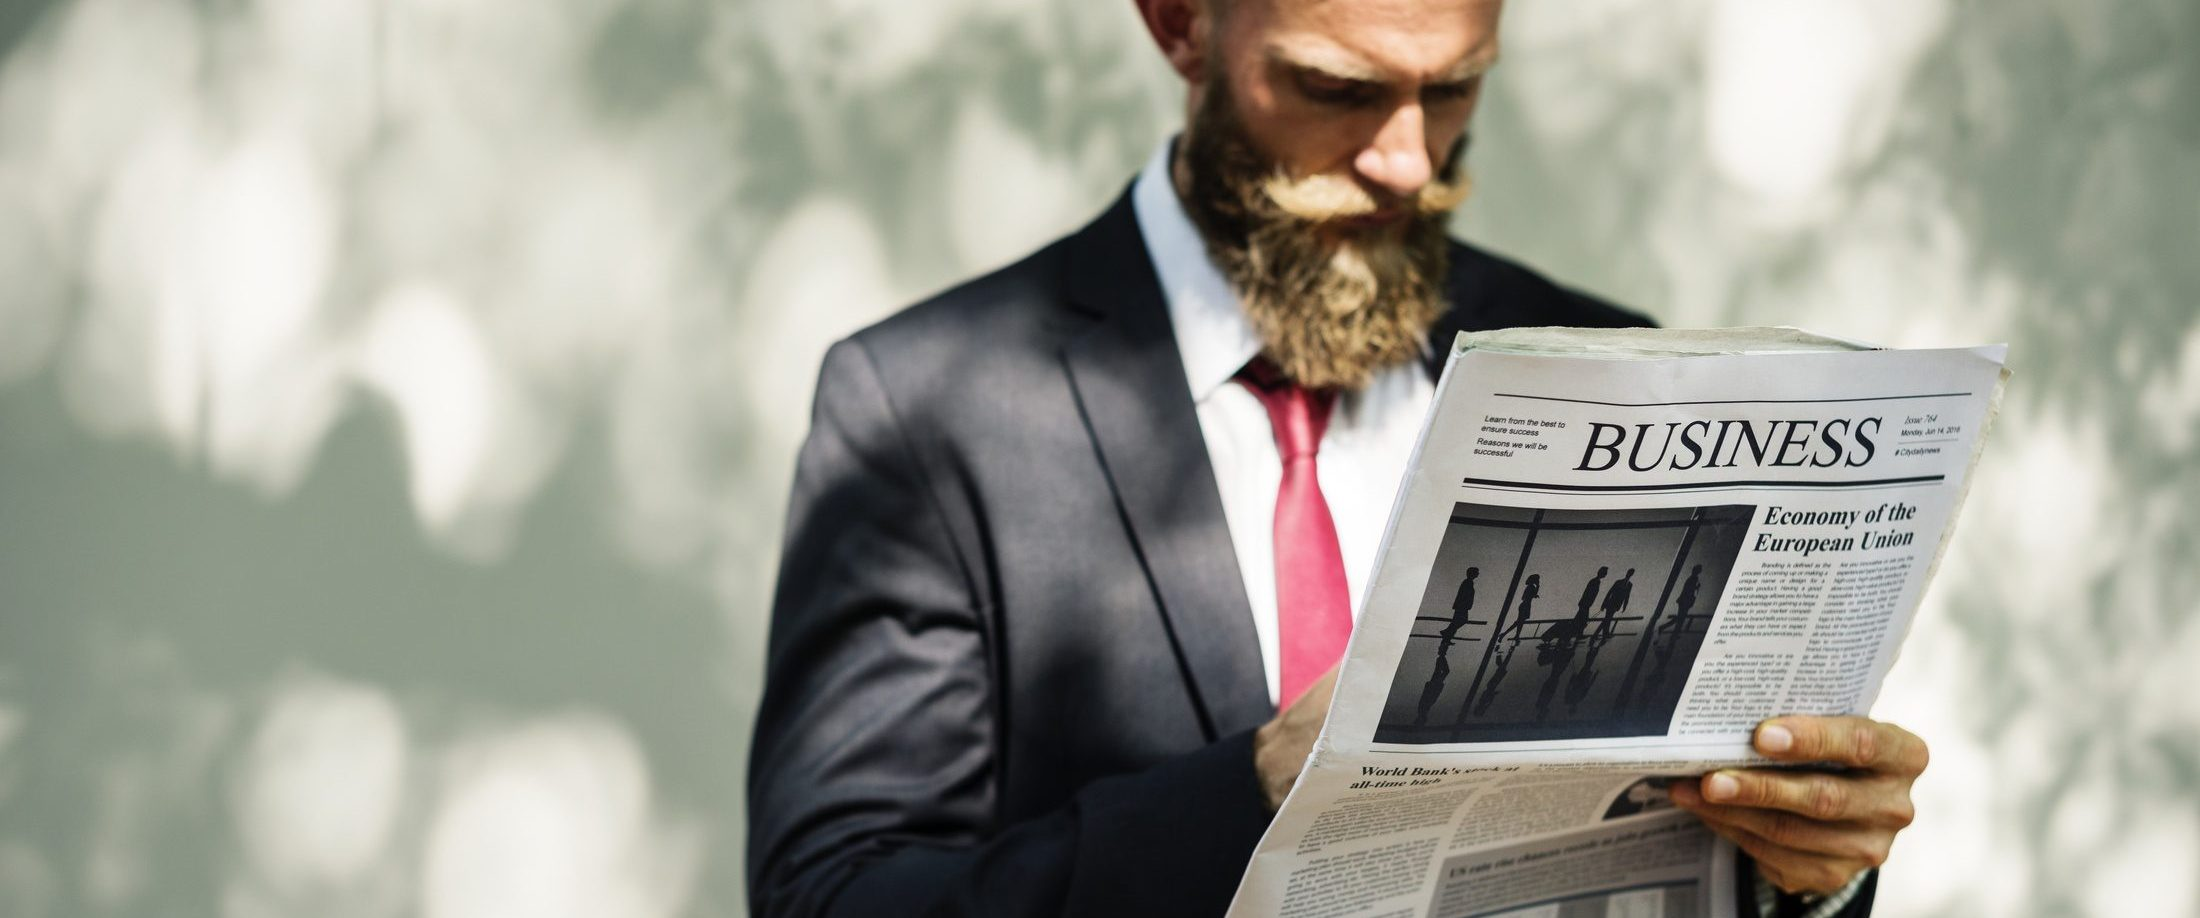 business finance actualites lyon journal entreprise info utiles